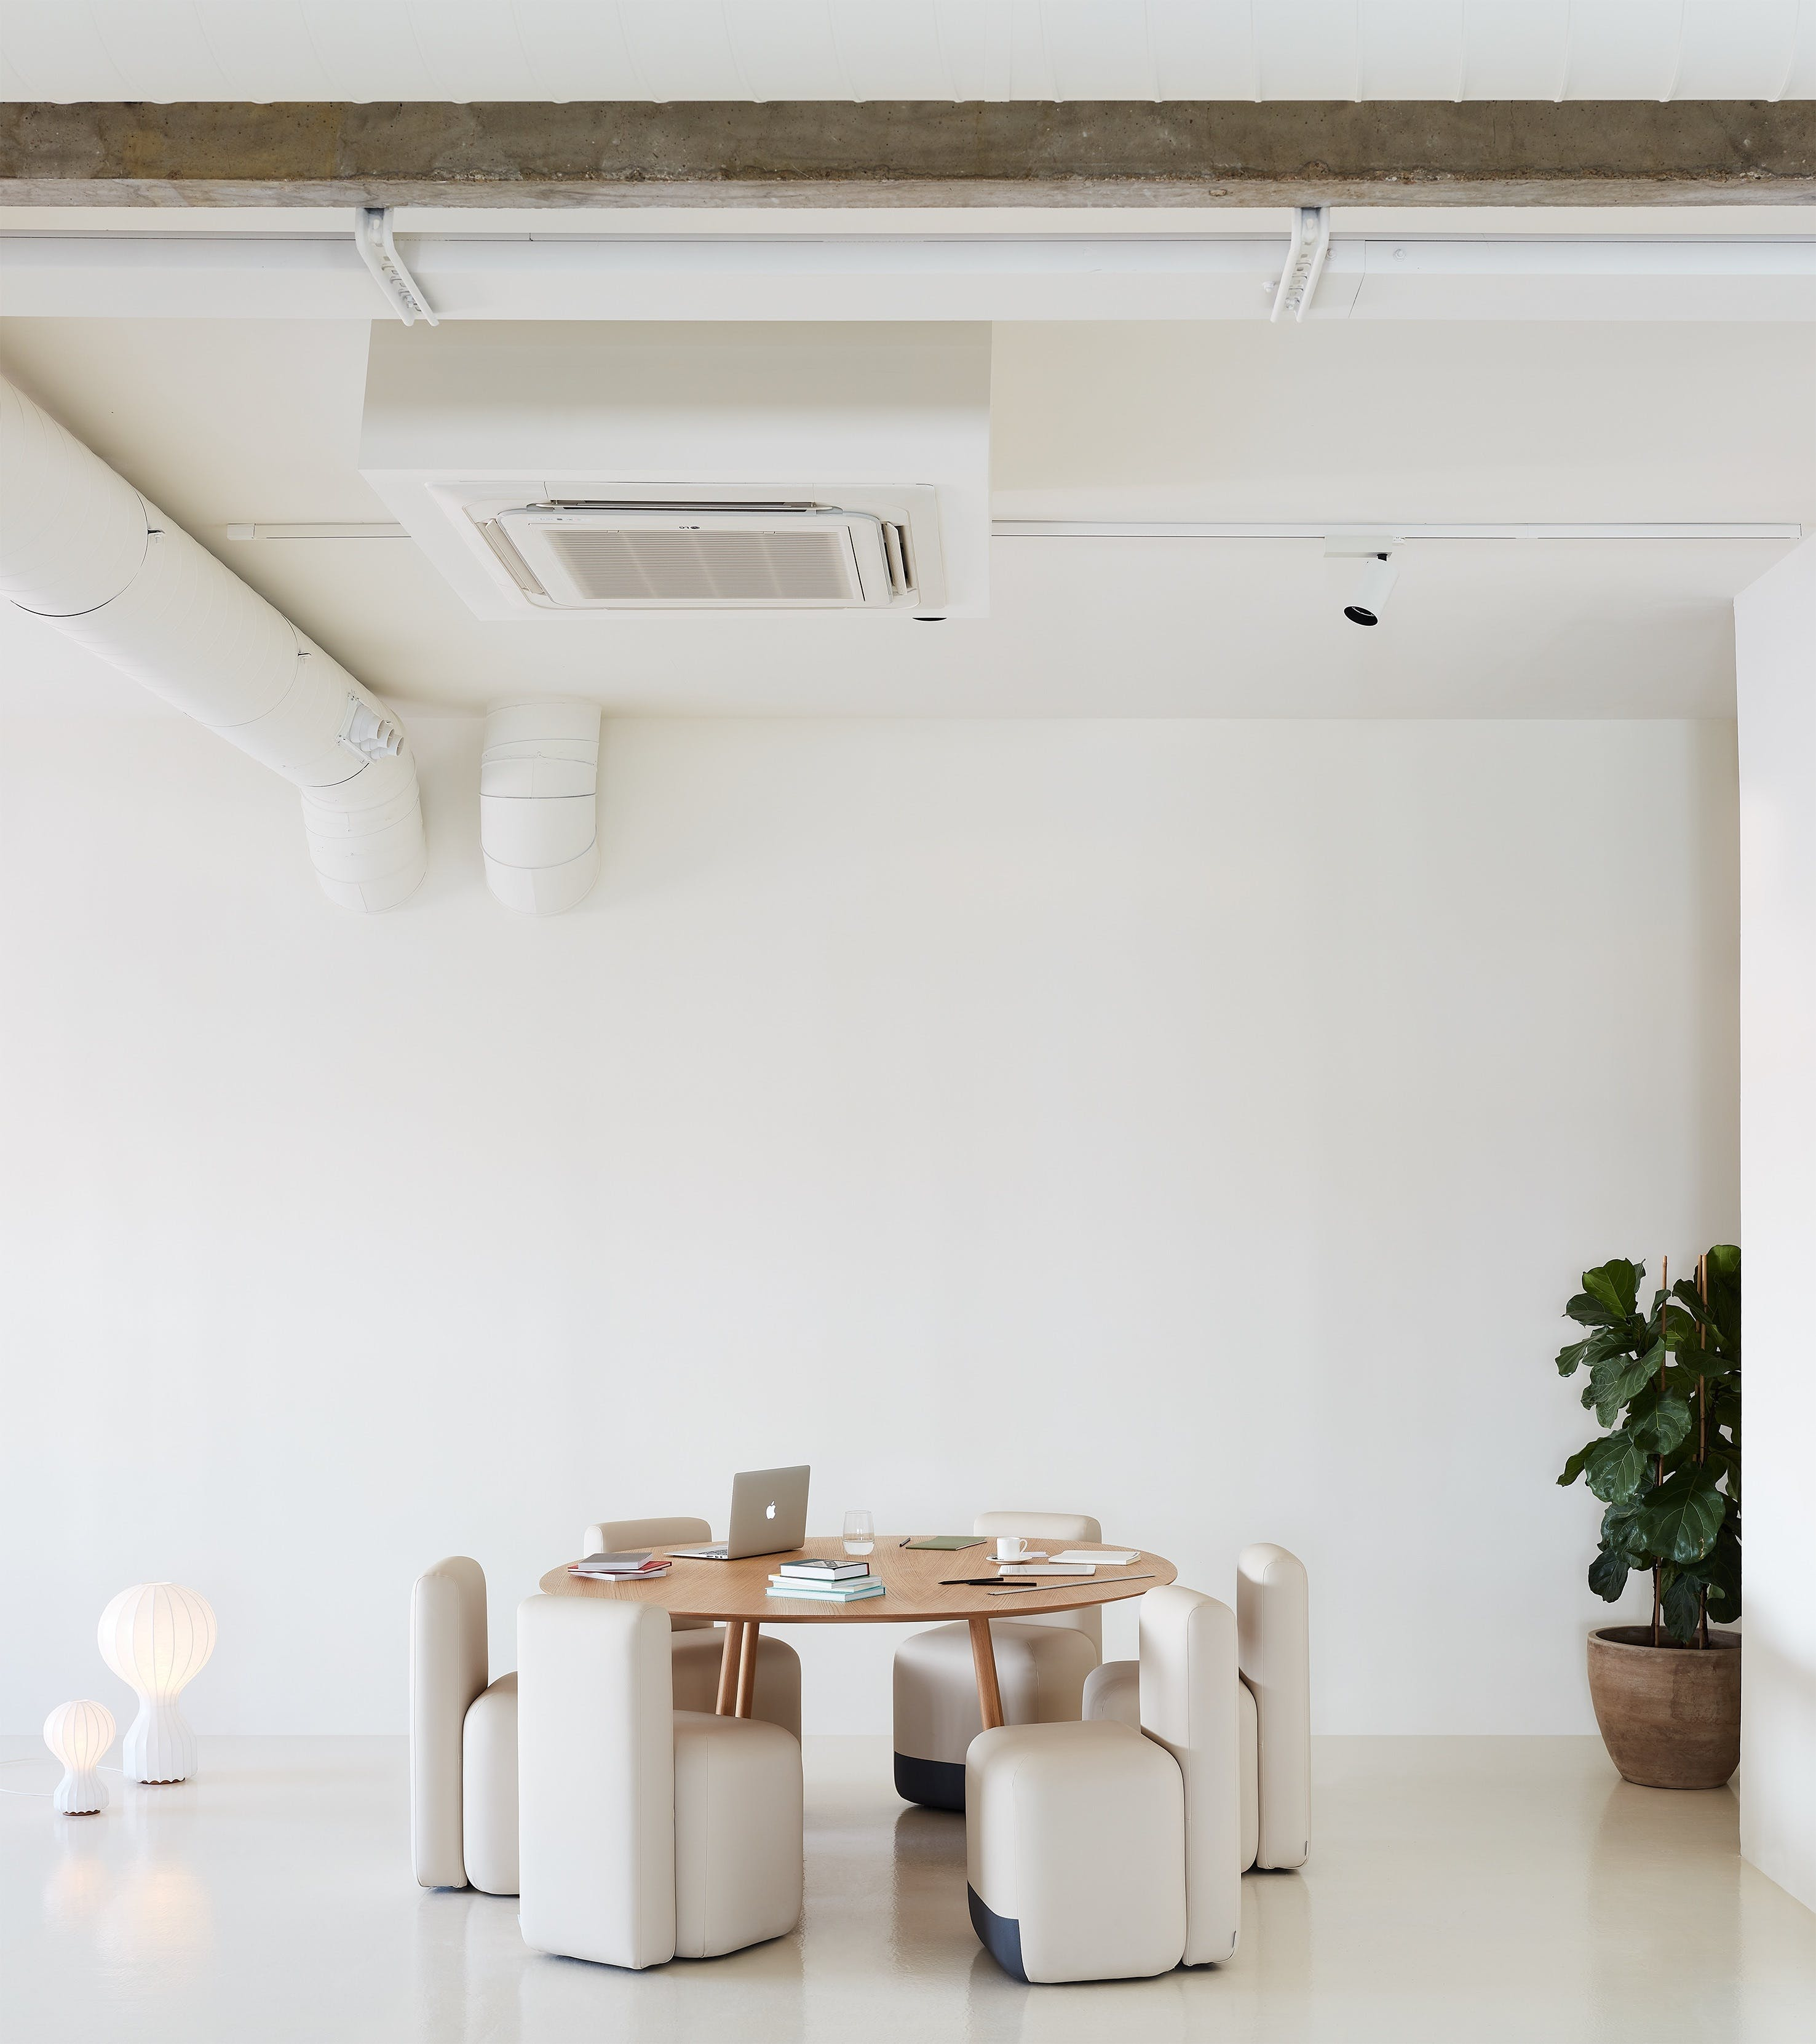 Viccarbe-stone-season-chair-institu-haute-living